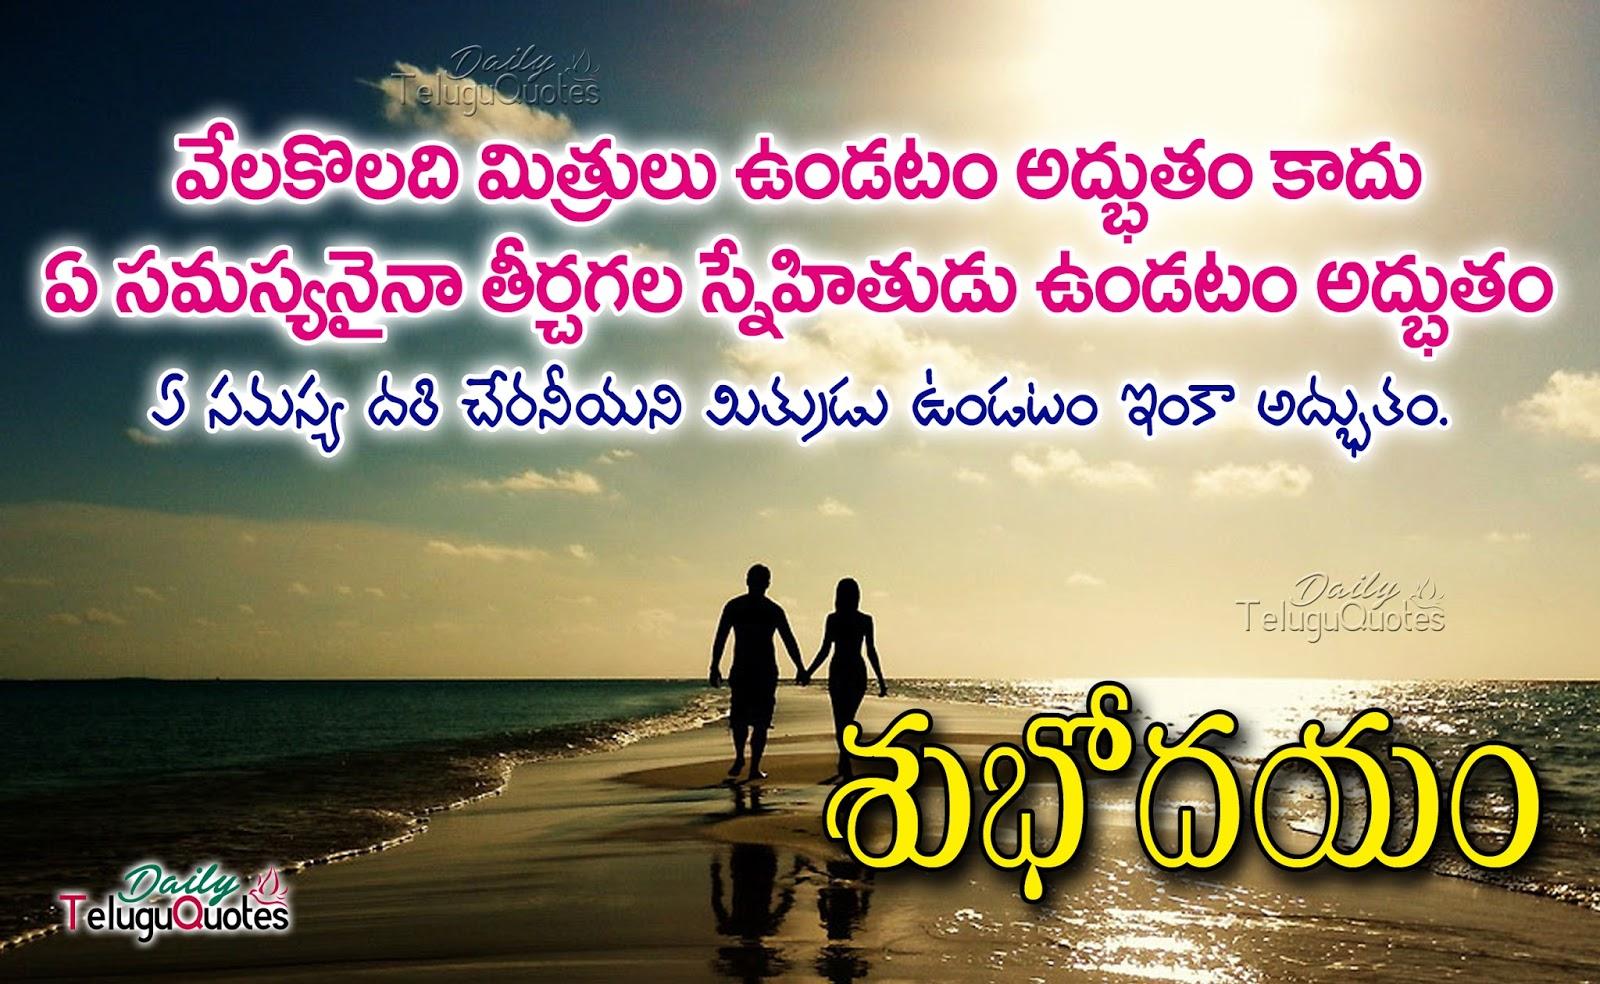 Good Morning Telugu Messages For Best Friends For Facebook